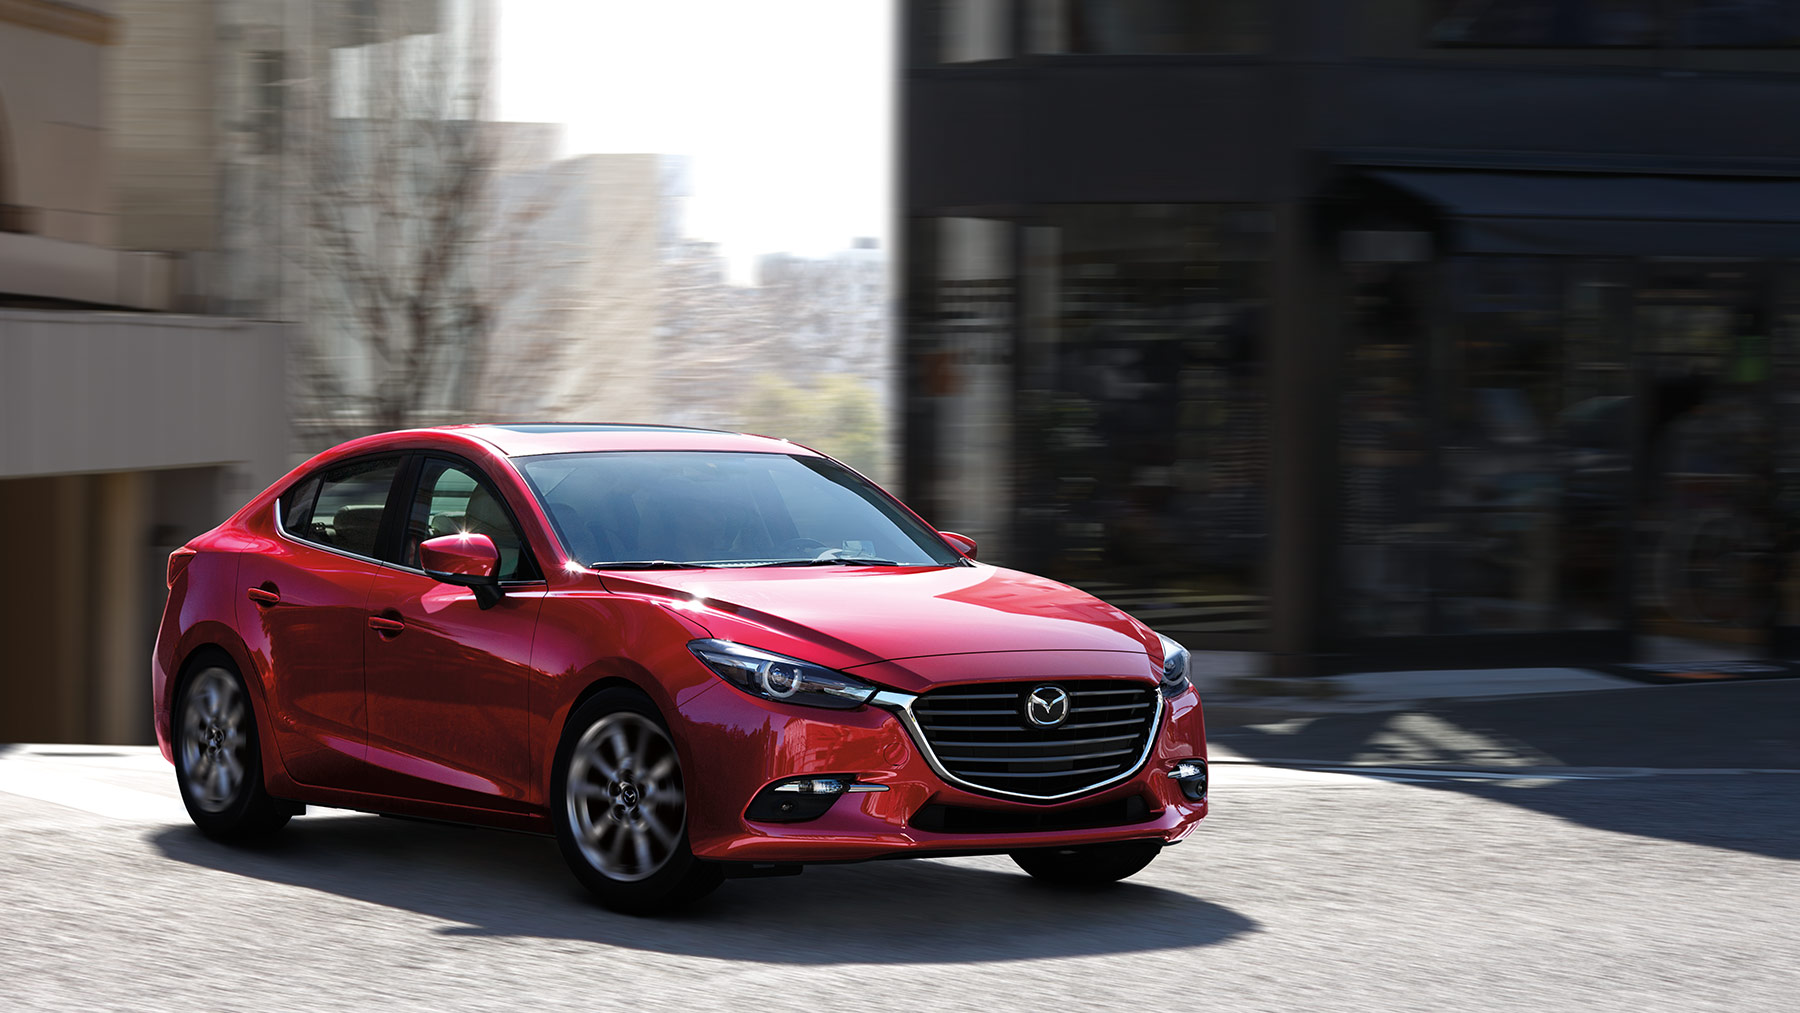 2018 Mazda 3 Front Driving Exterior